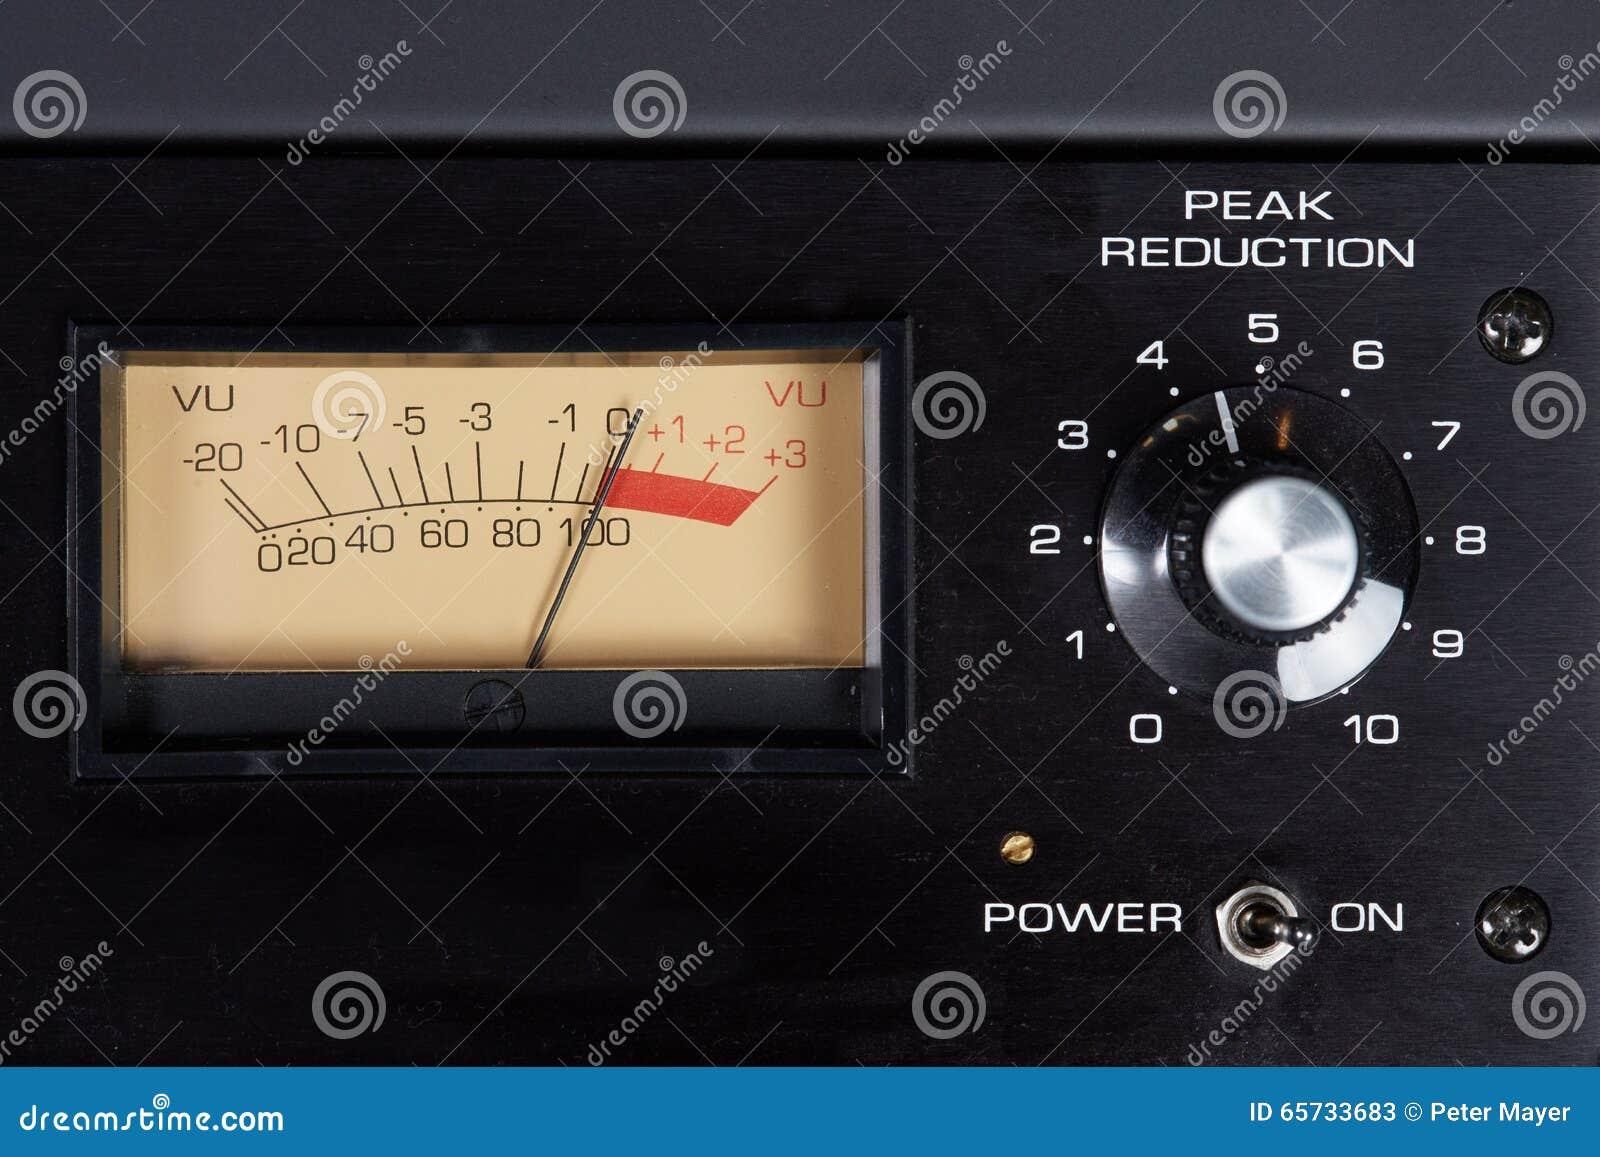 Analog Meter Background : Peak reduction audio hardware with analog vu meter stock